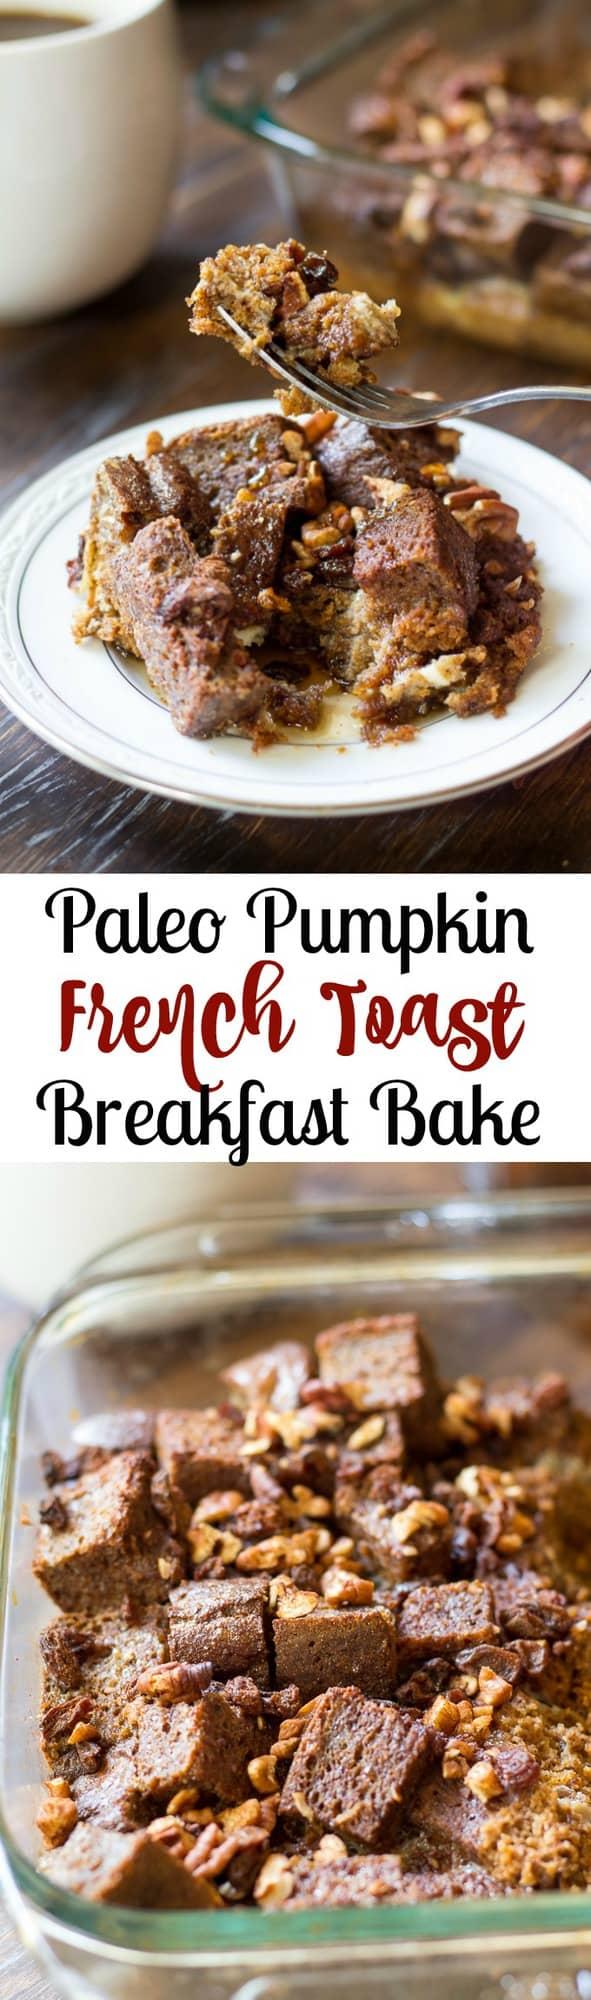 Paleo Pumpkin French Toast Bake | The Paleo Running Momma